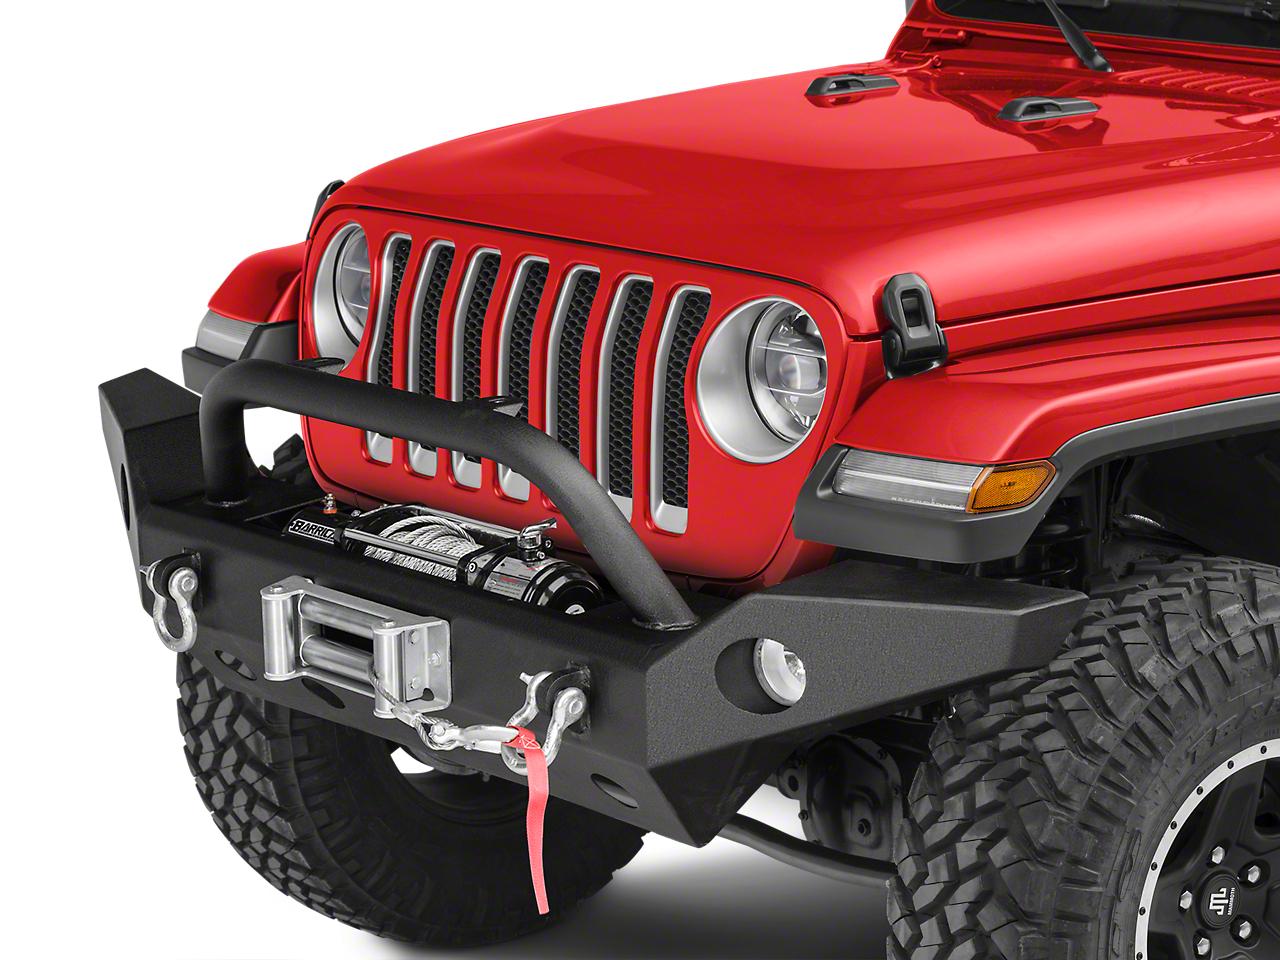 Barricade Trail Force HD Full Width Front Bumper & 9,500 lb. Winch Combo (2018 Wrangler JL)